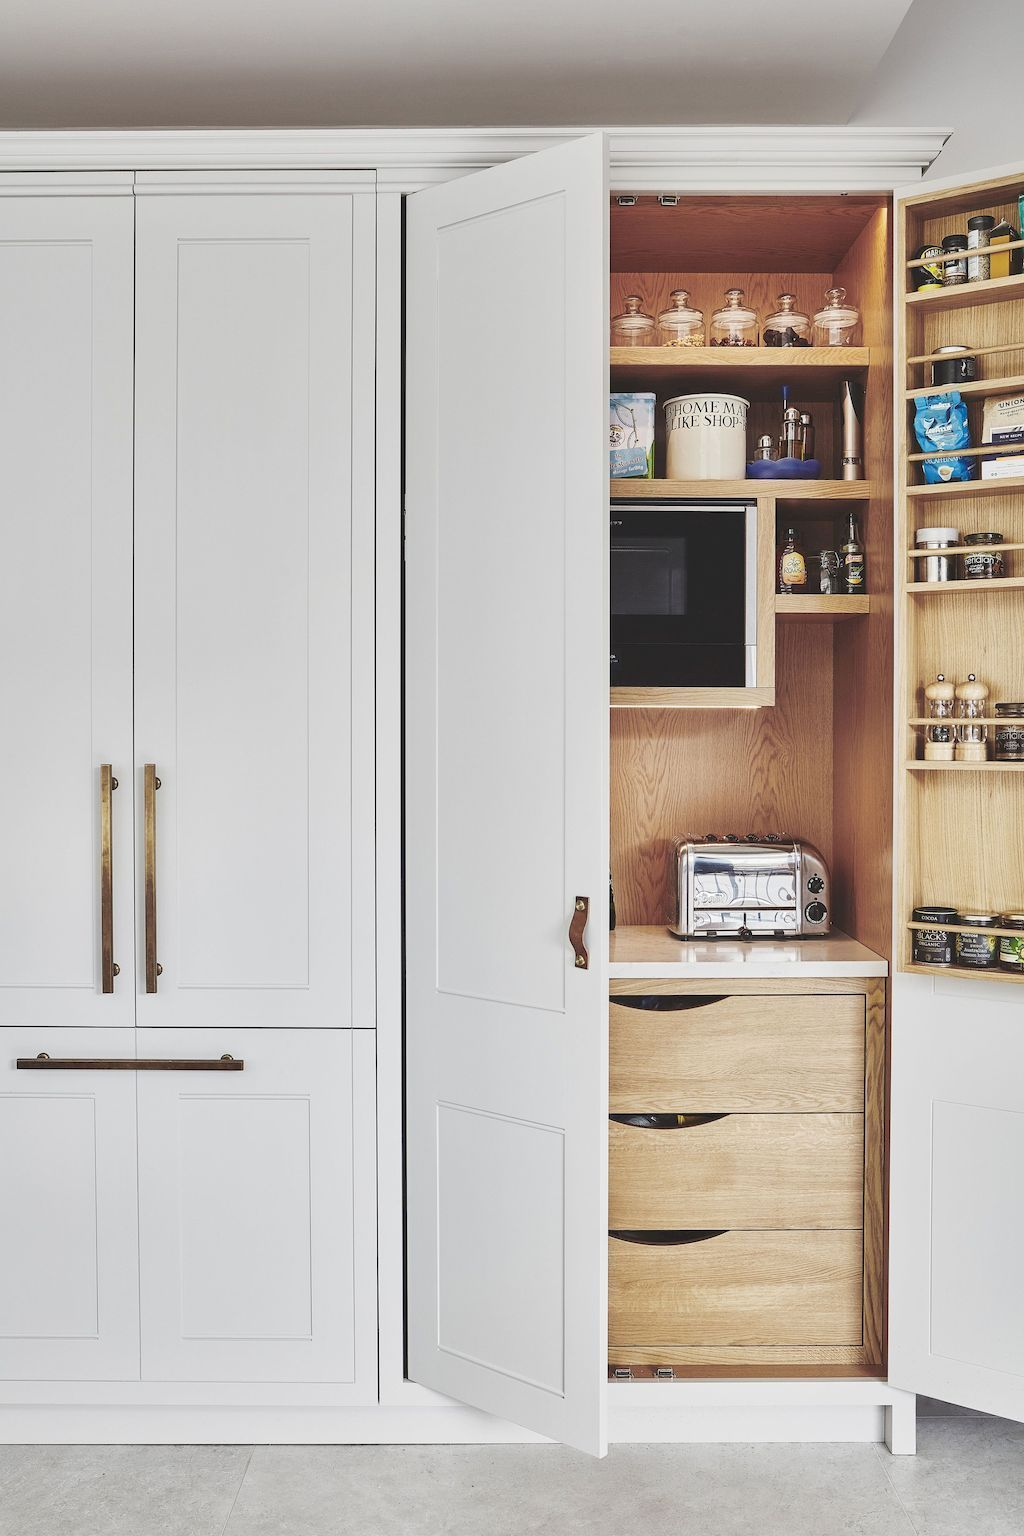 14 brilliant kitchen cabinet organization and tips ideas on brilliant kitchen cabinet organization id=27031